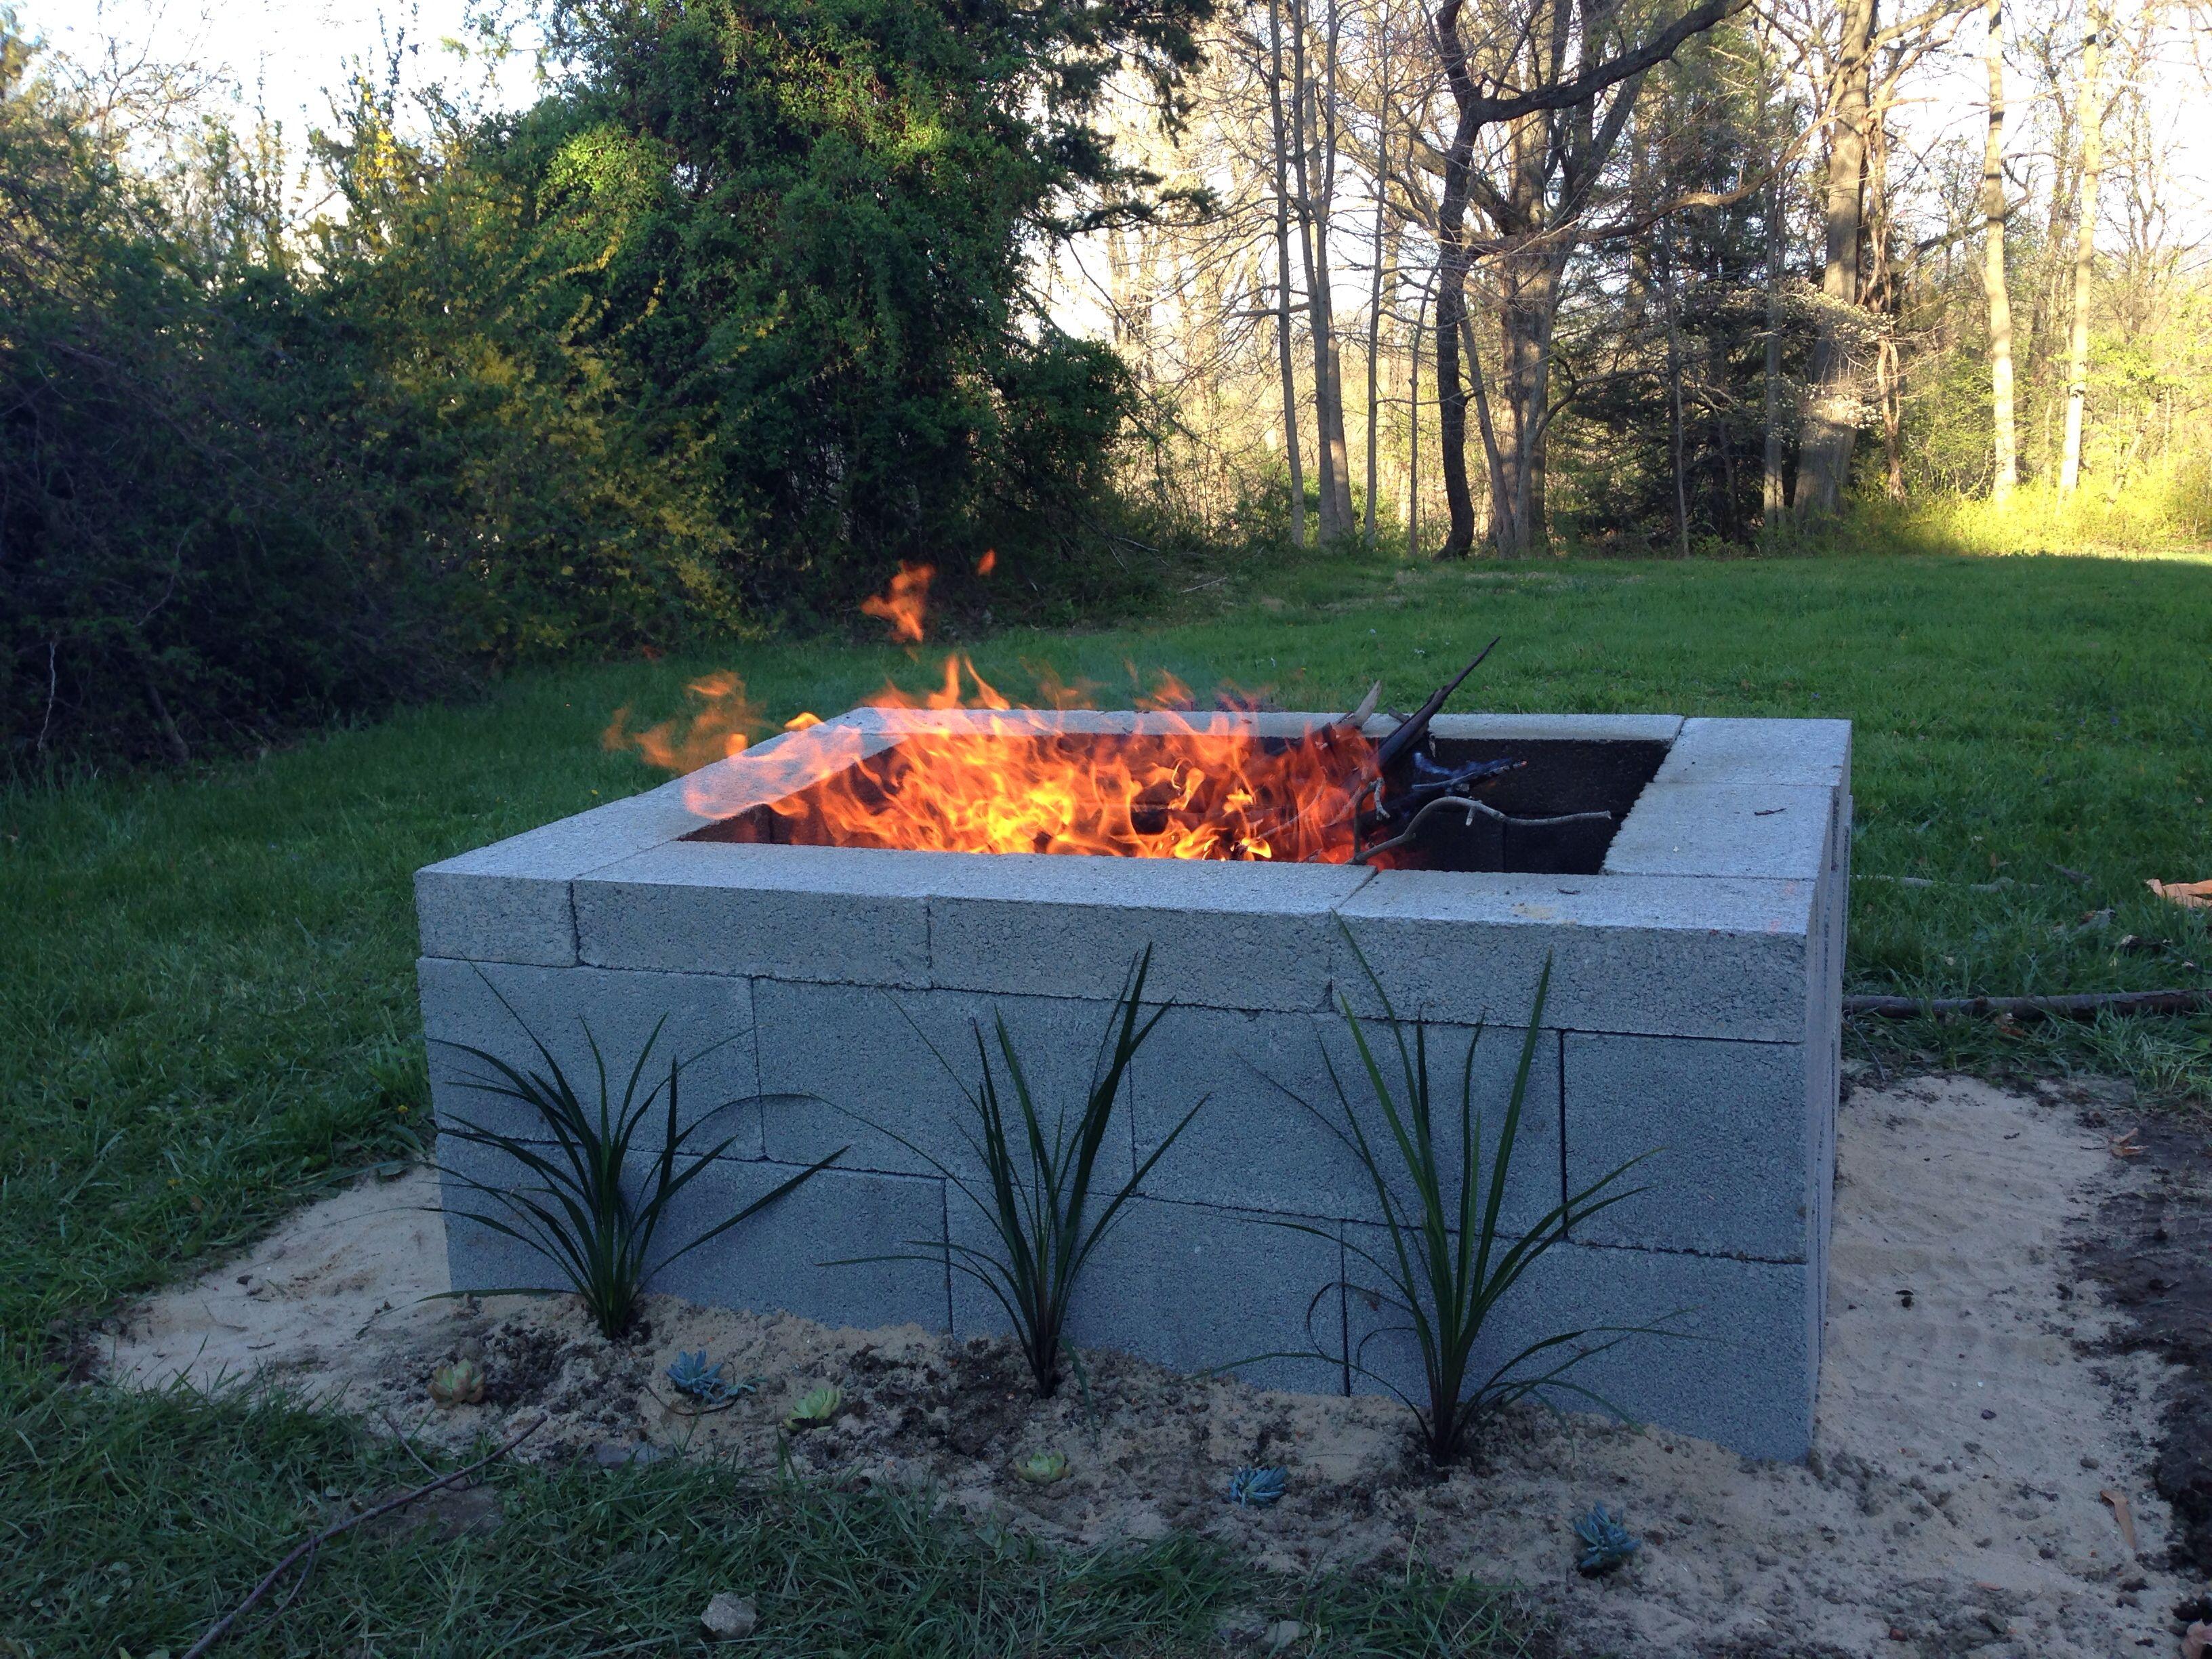 Cinder Block Outdoor Fireplace Elegant 15 Outstanding Cinder Block Fire Pit Design Ideas for